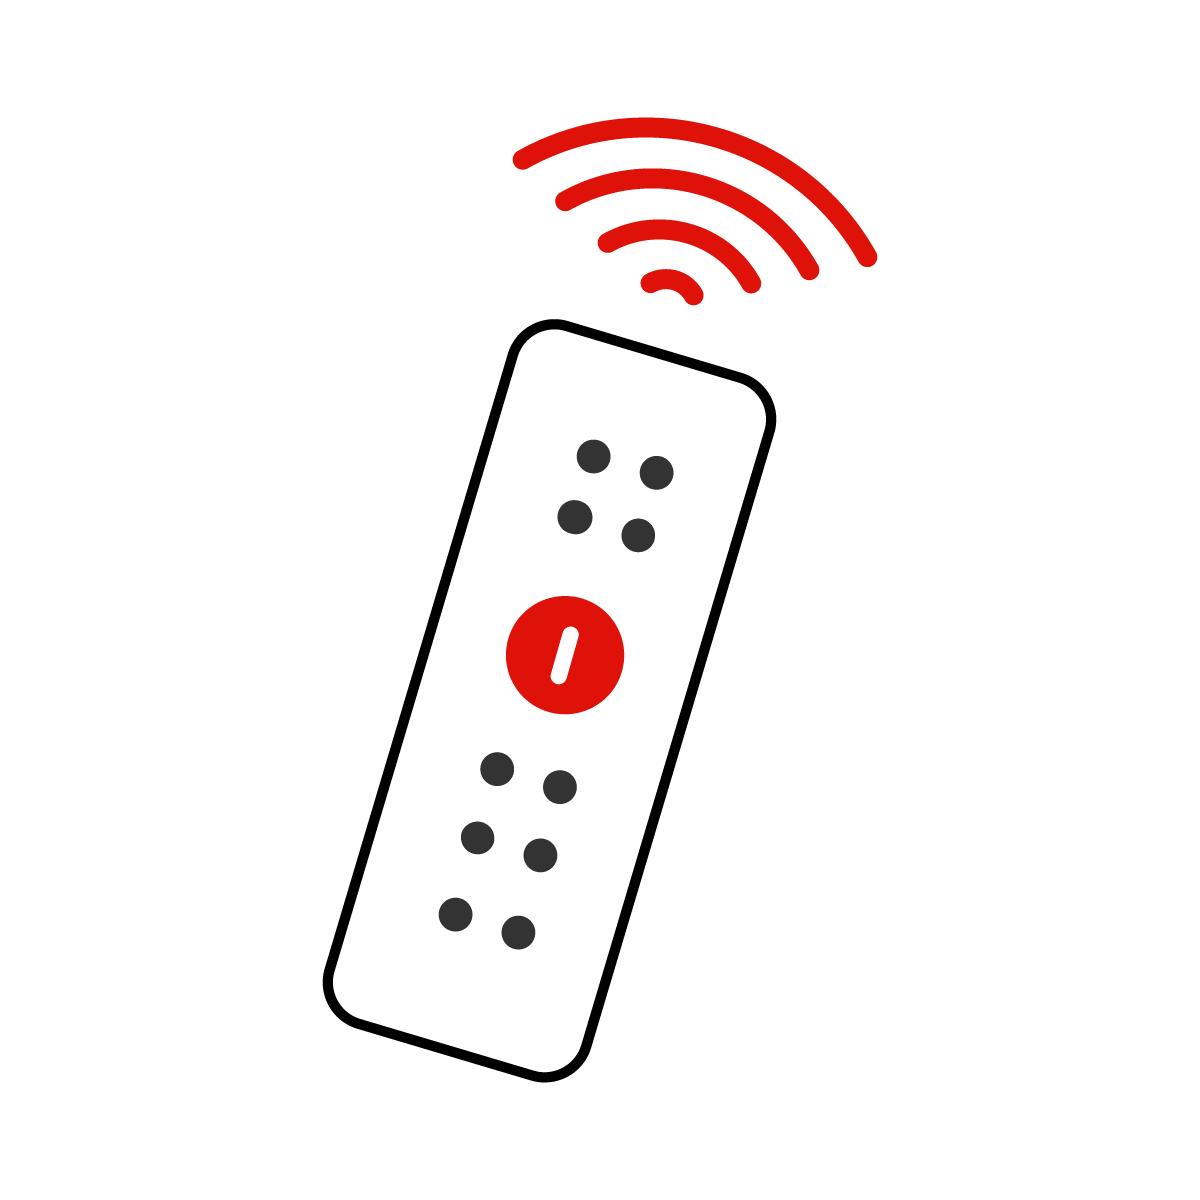 Interruptores y controladores dom%c3%b3ticos 36aea9ce 6103 41b8 b7eb c24b08d369b7